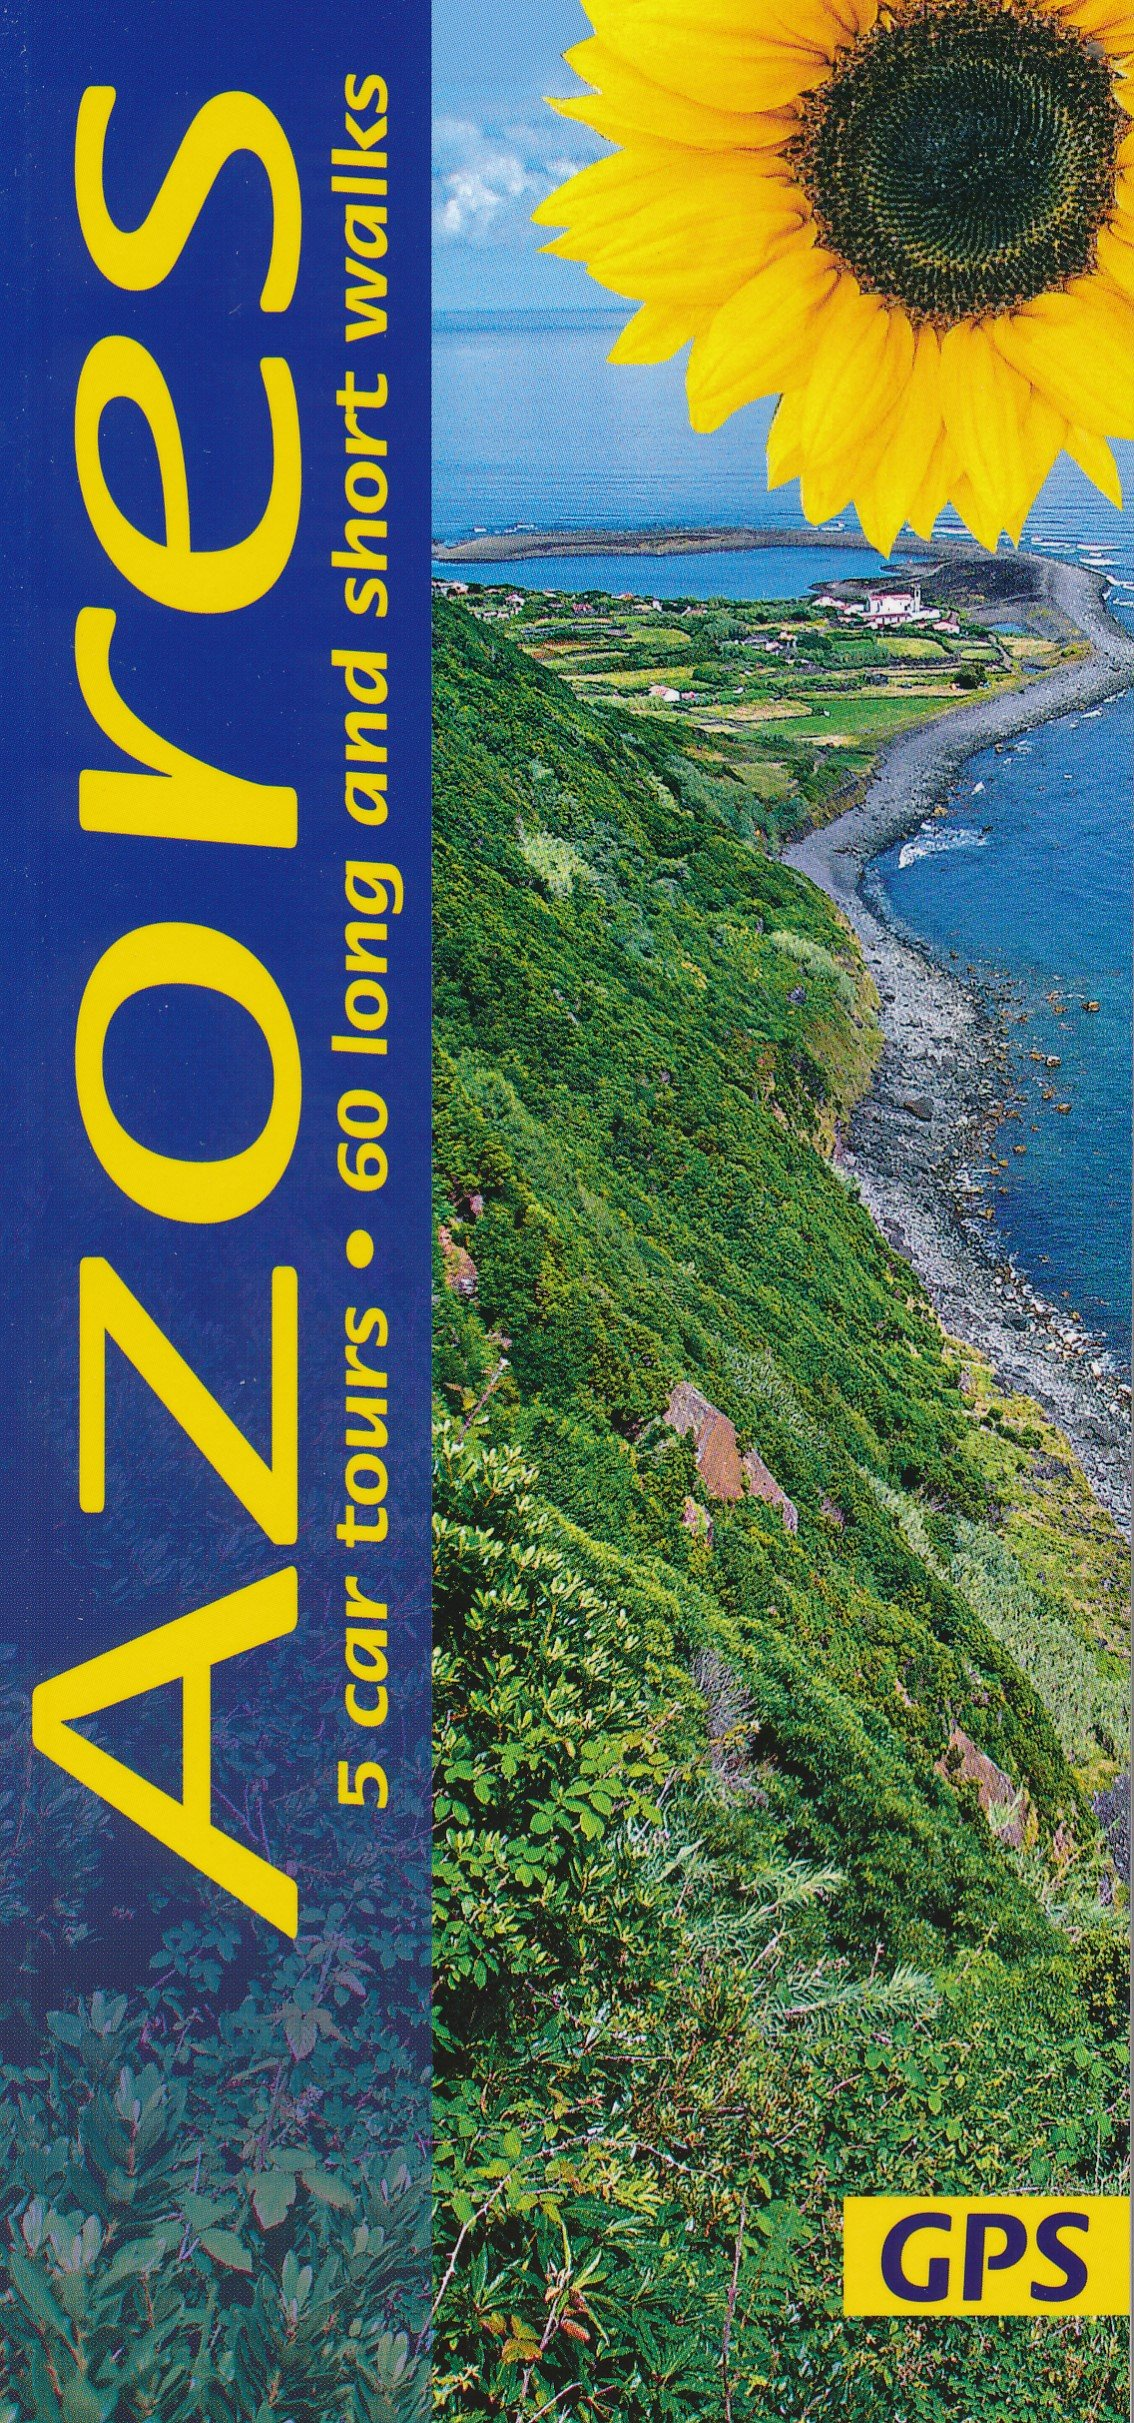 Sunflower Azores 9781856915120  Sunflower Landscapes  Wandelgidsen Azoren